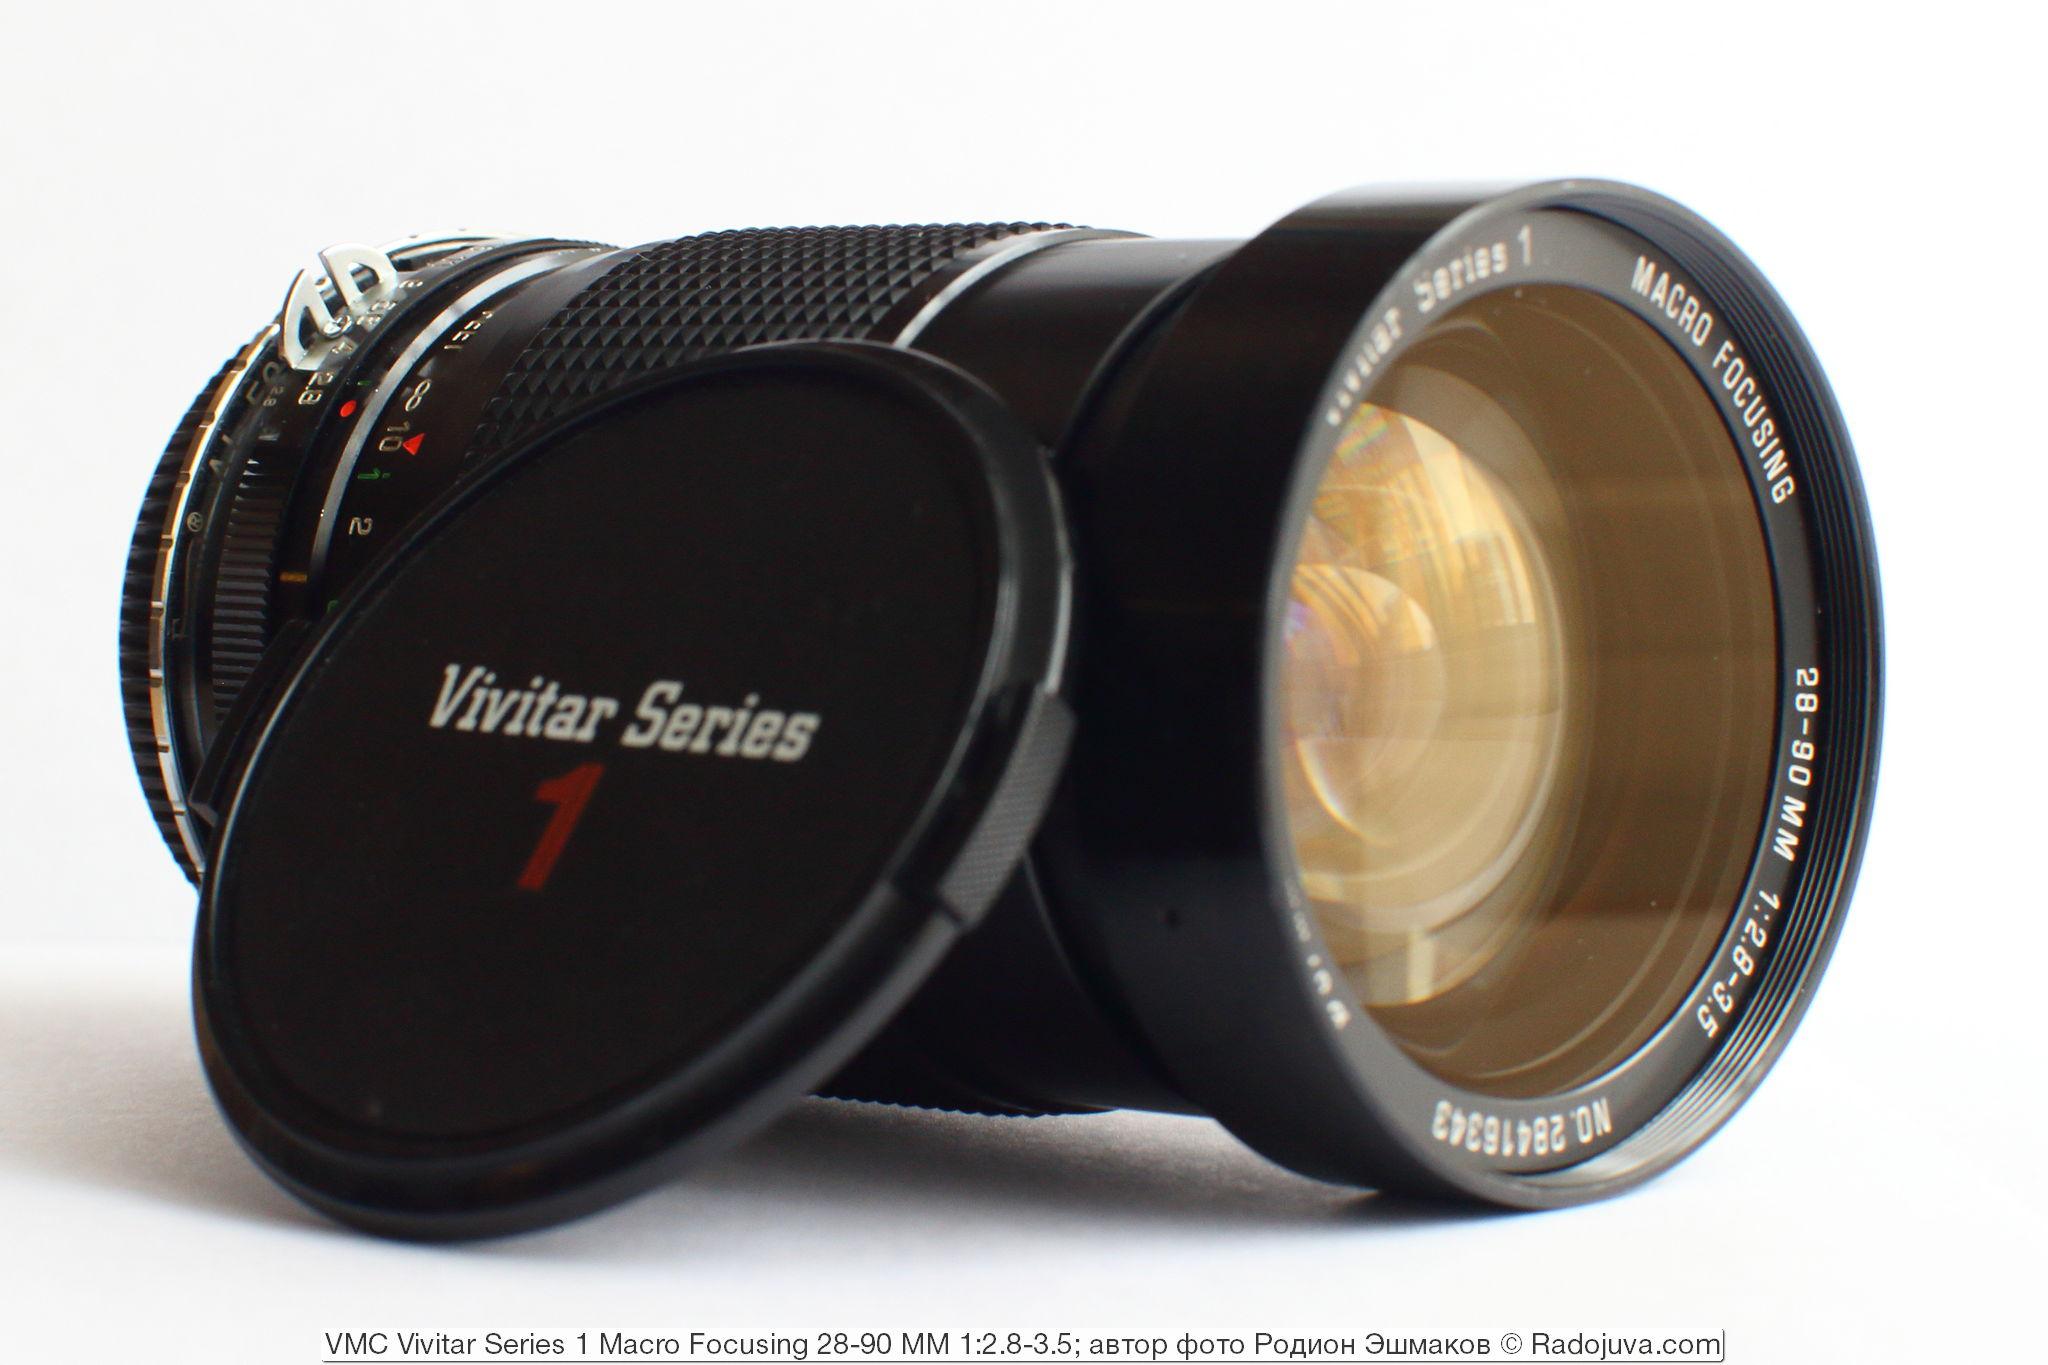 Вид объектива с надетым переходником Nikon F-Canon EF.